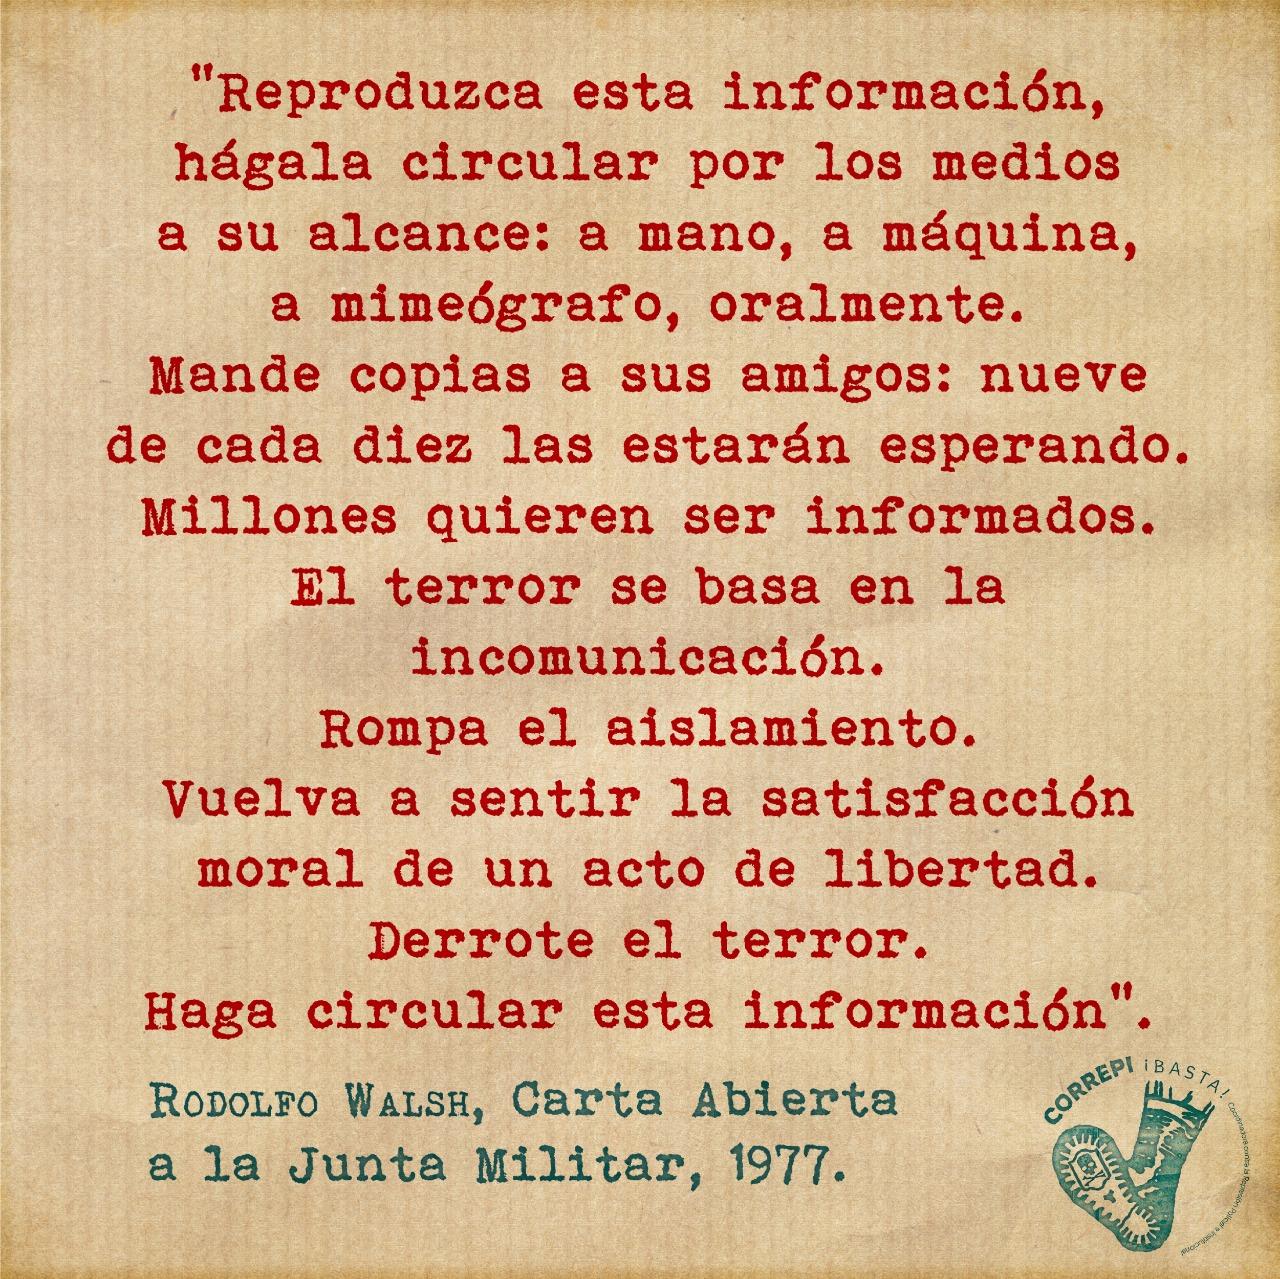 Rodolfo Walsh Carta a la Junta Militar